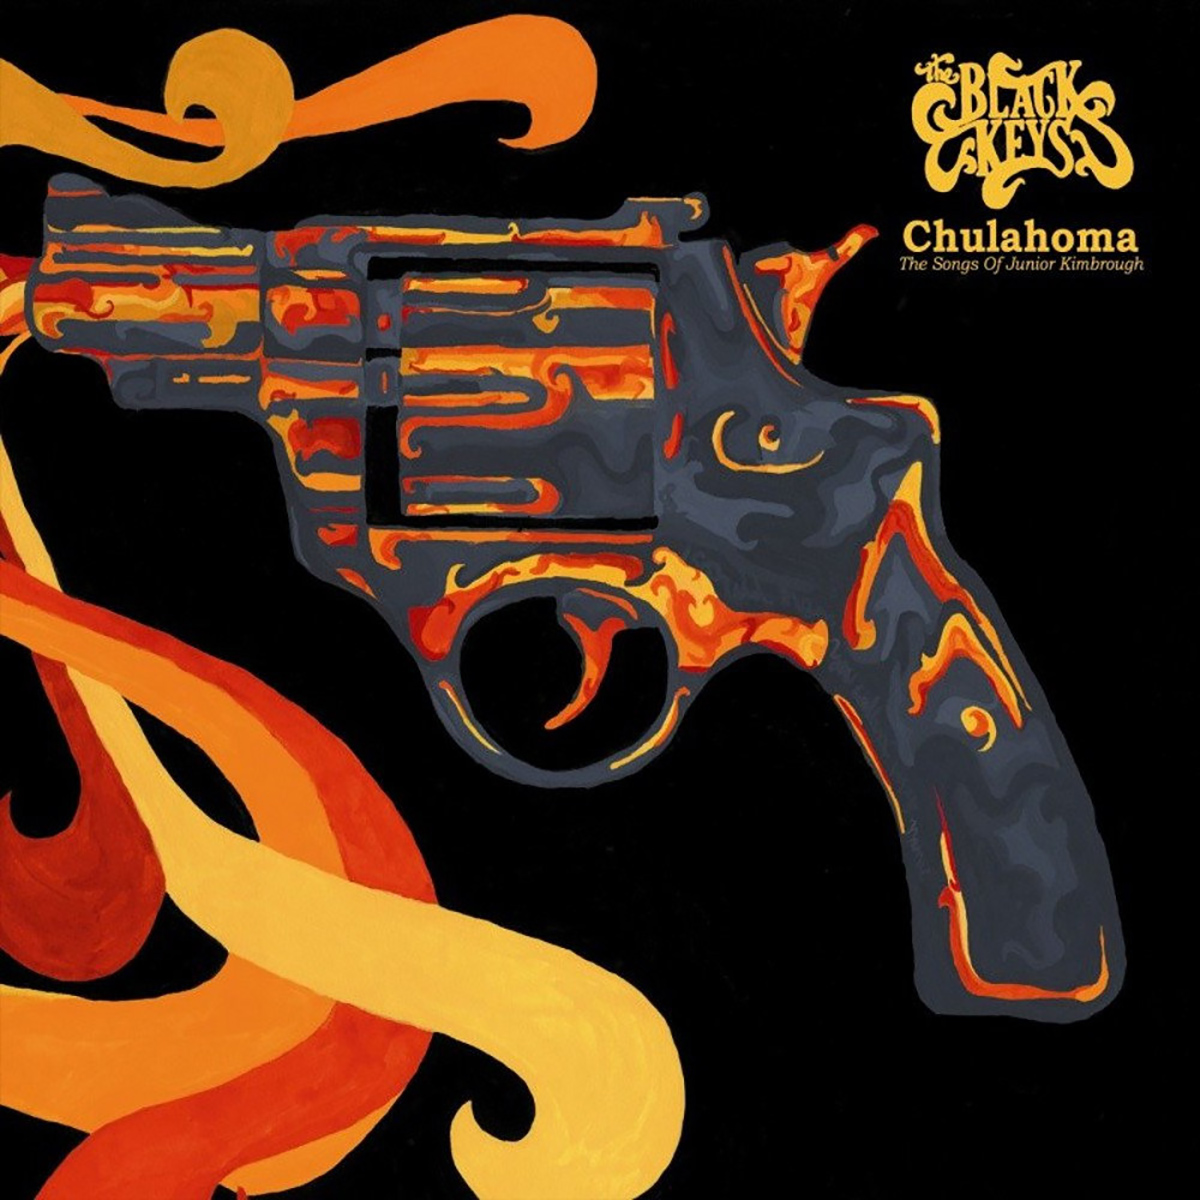 The Black Keys, Chulahoma